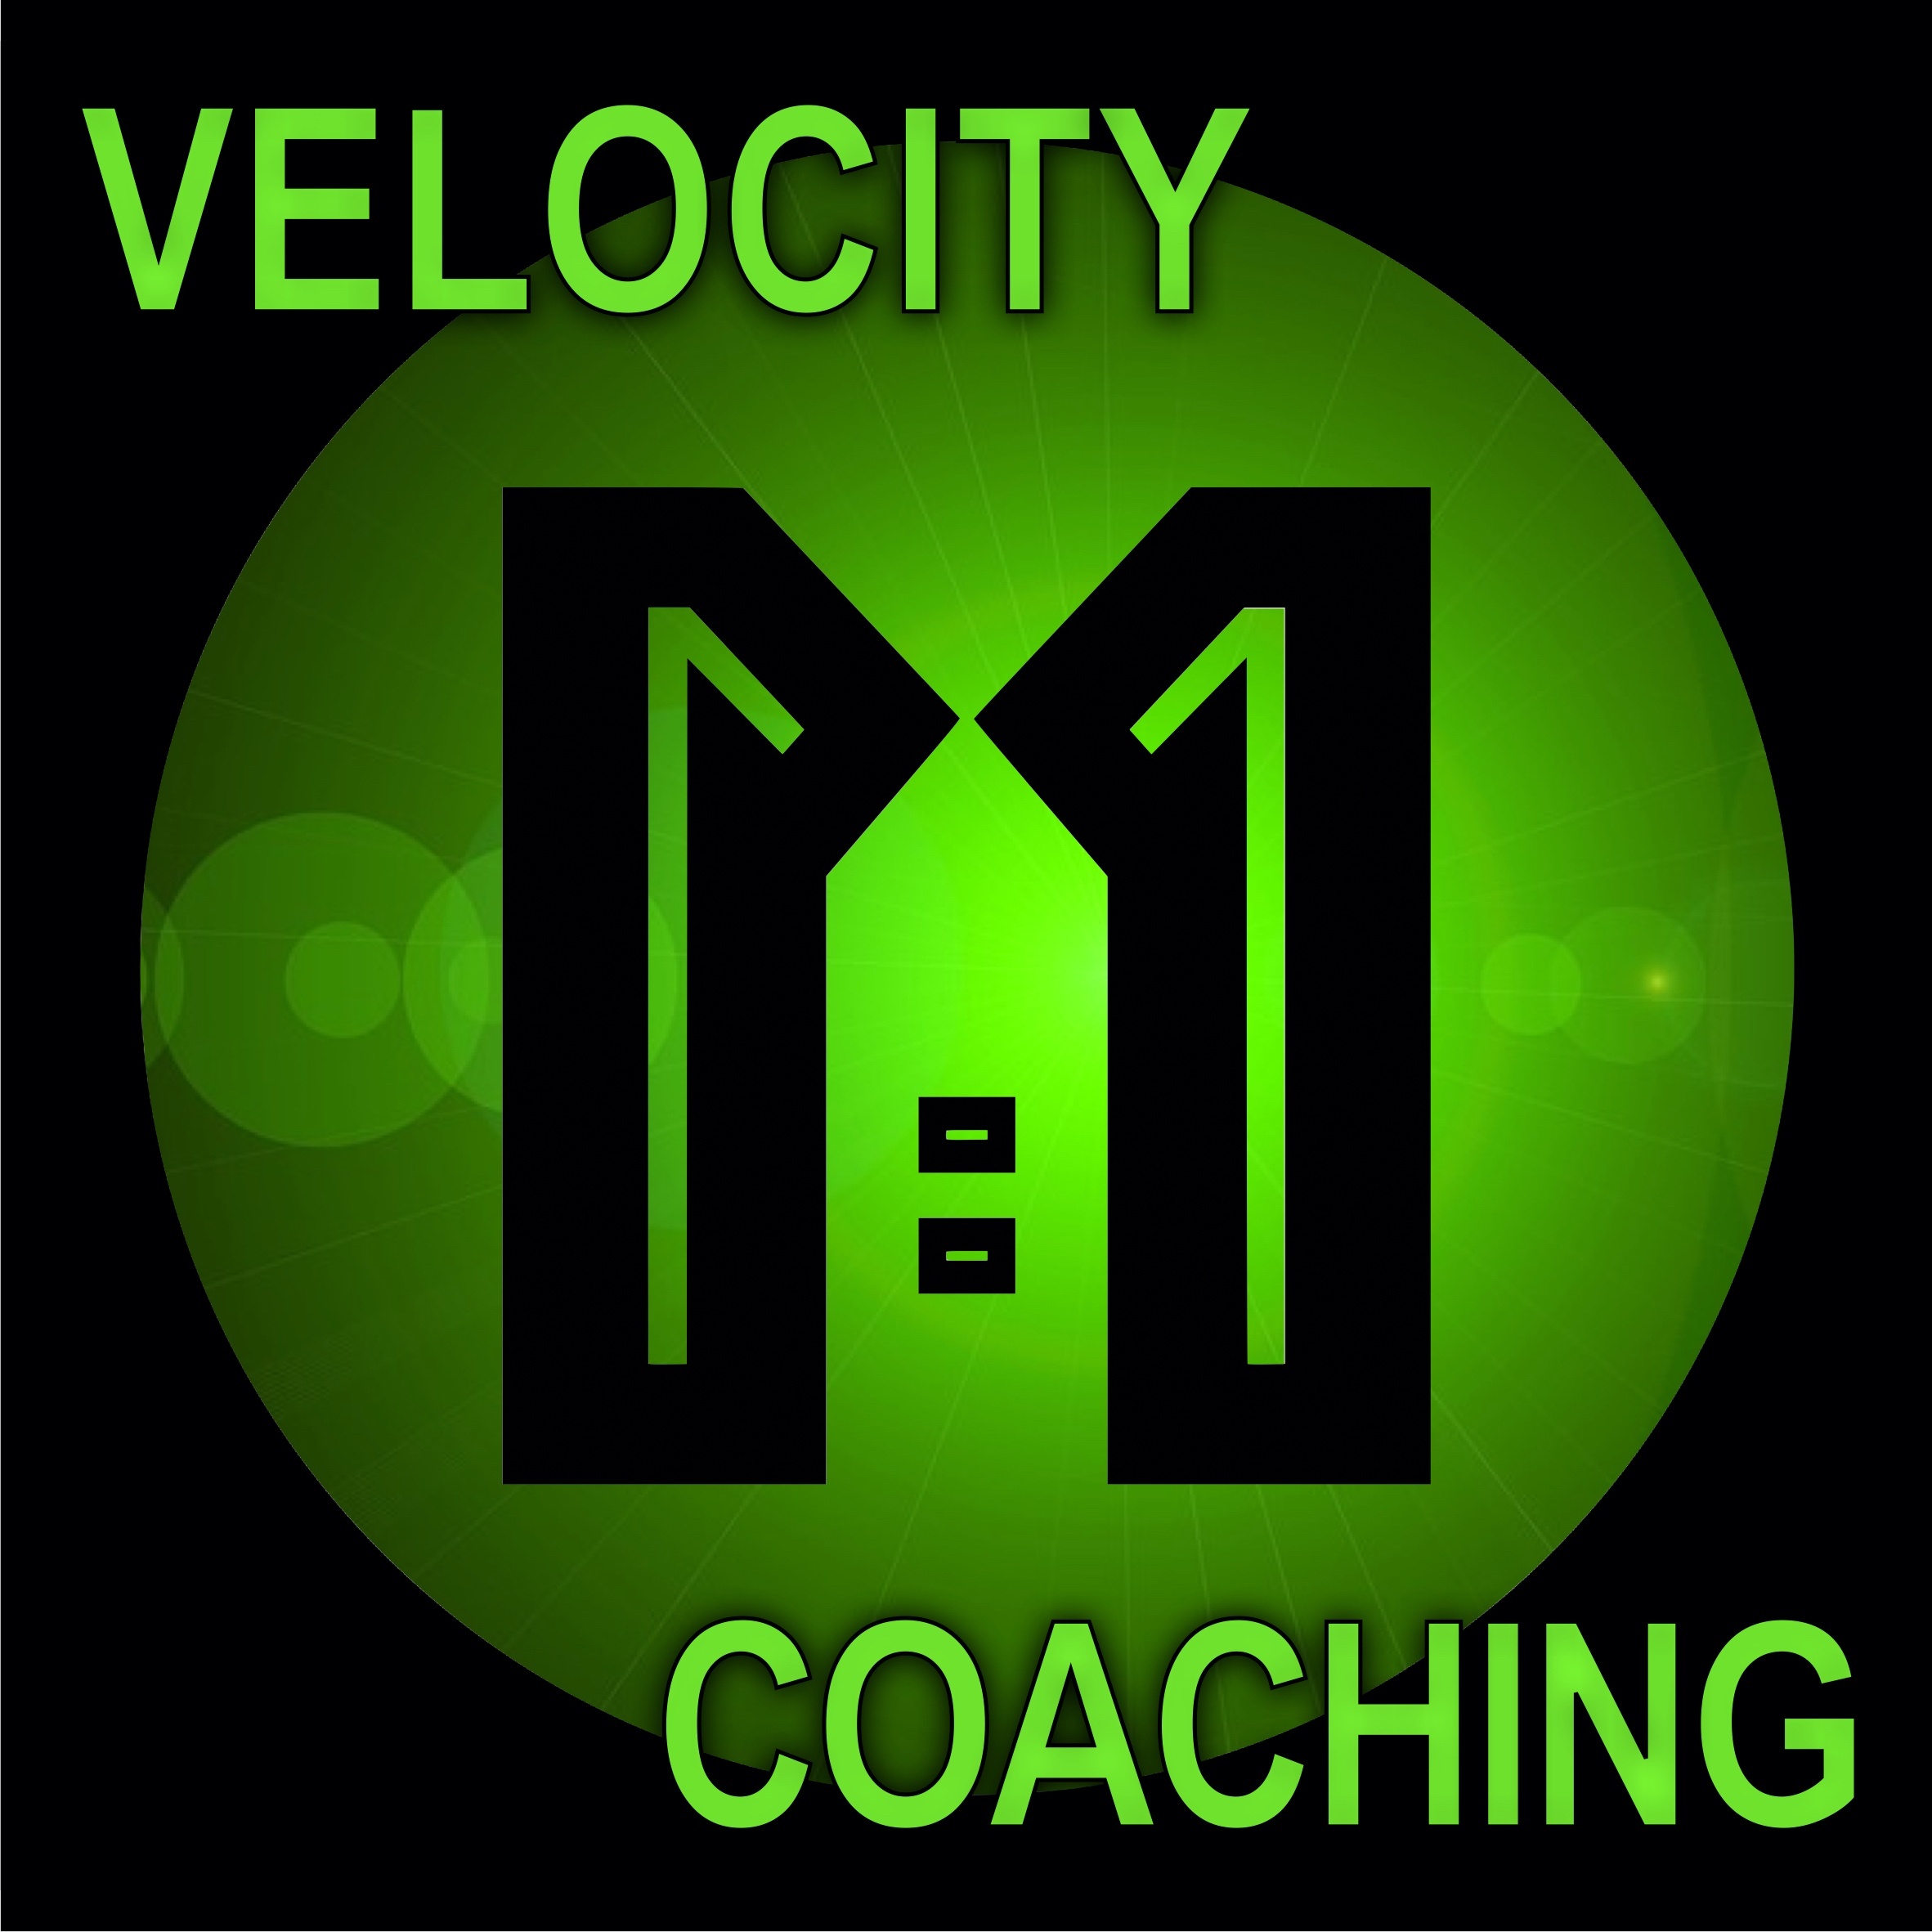 Velocity 1 to 1 coaching